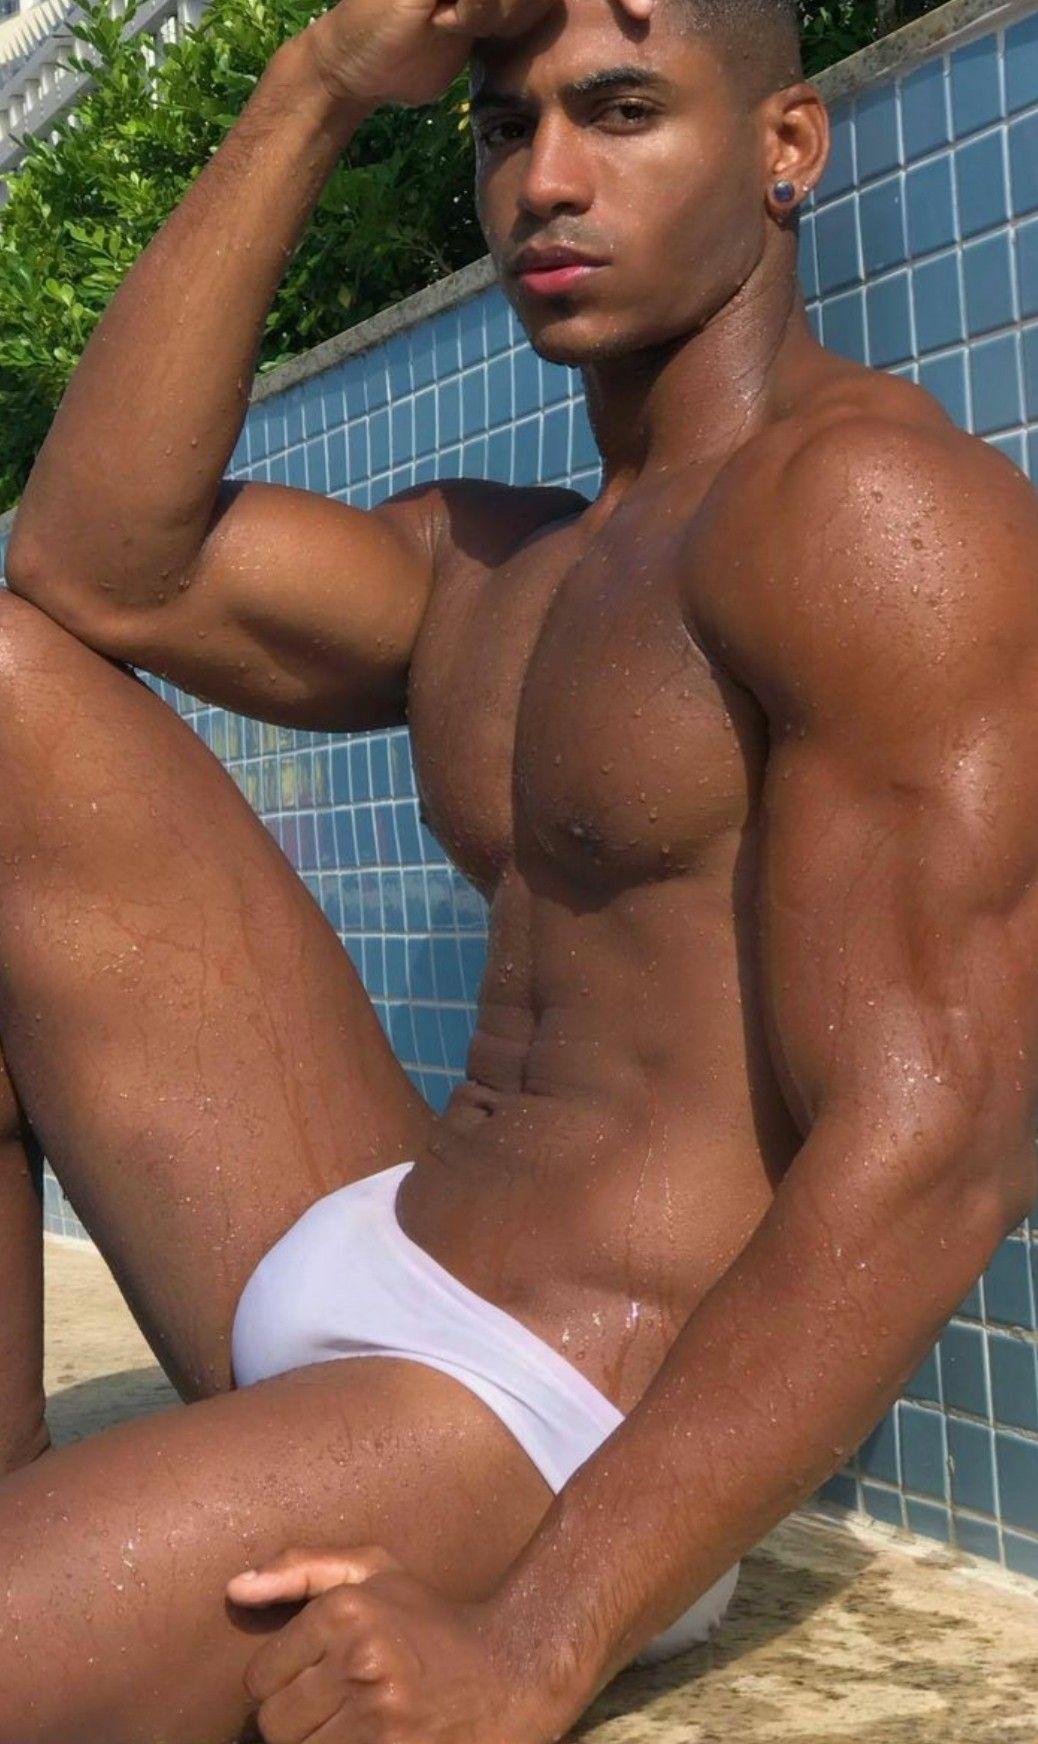 Gay male sailors nude